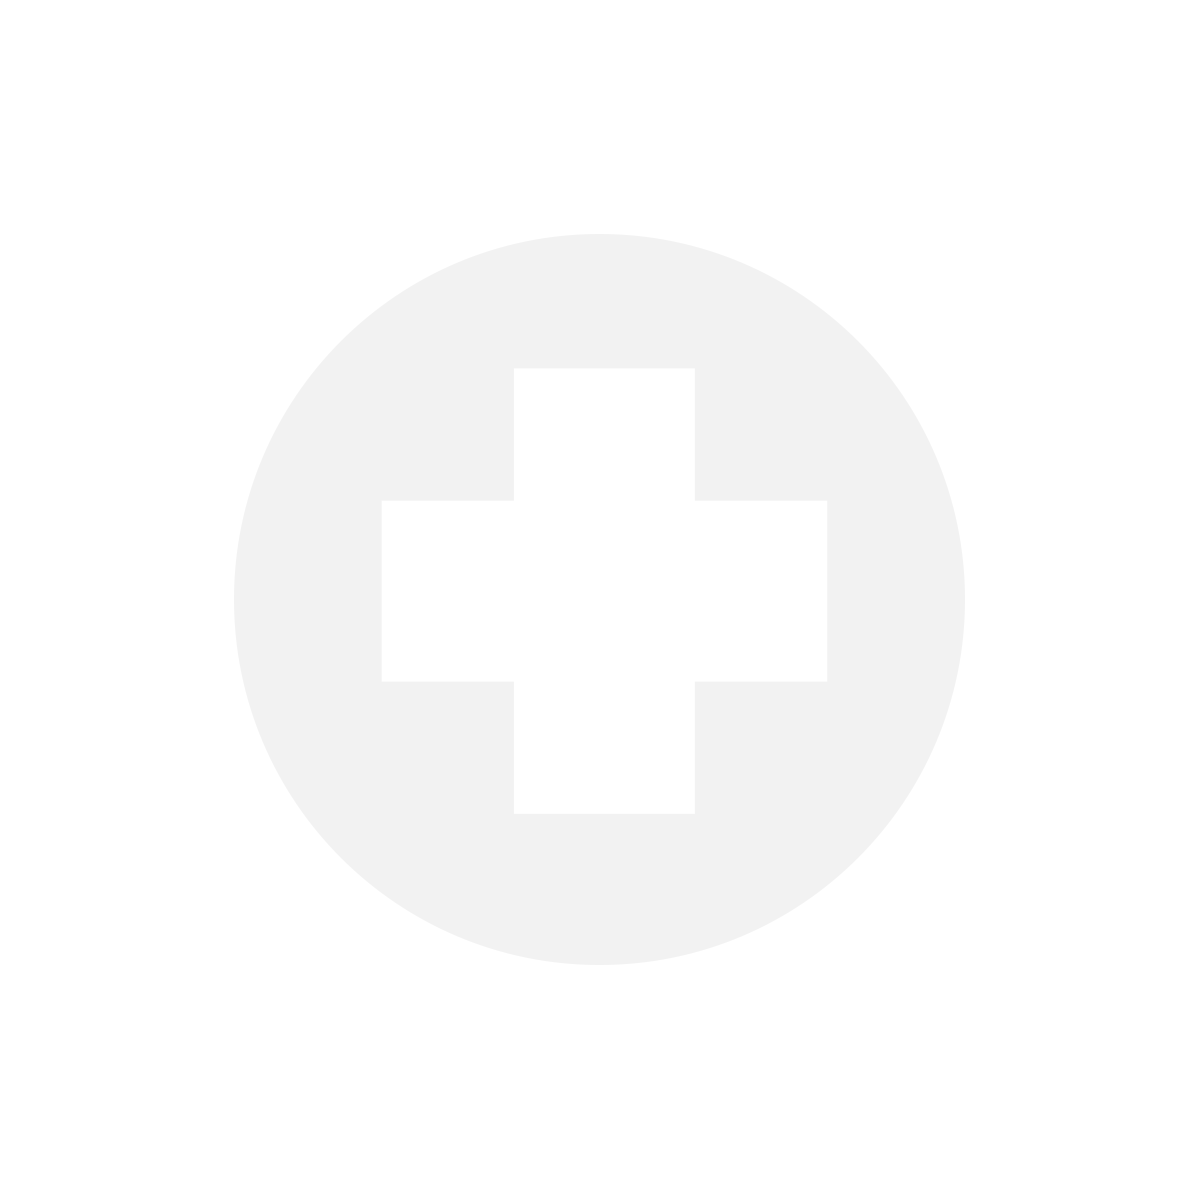 PHYSIOTHERAPIE.com CD de formation crochetage indolore